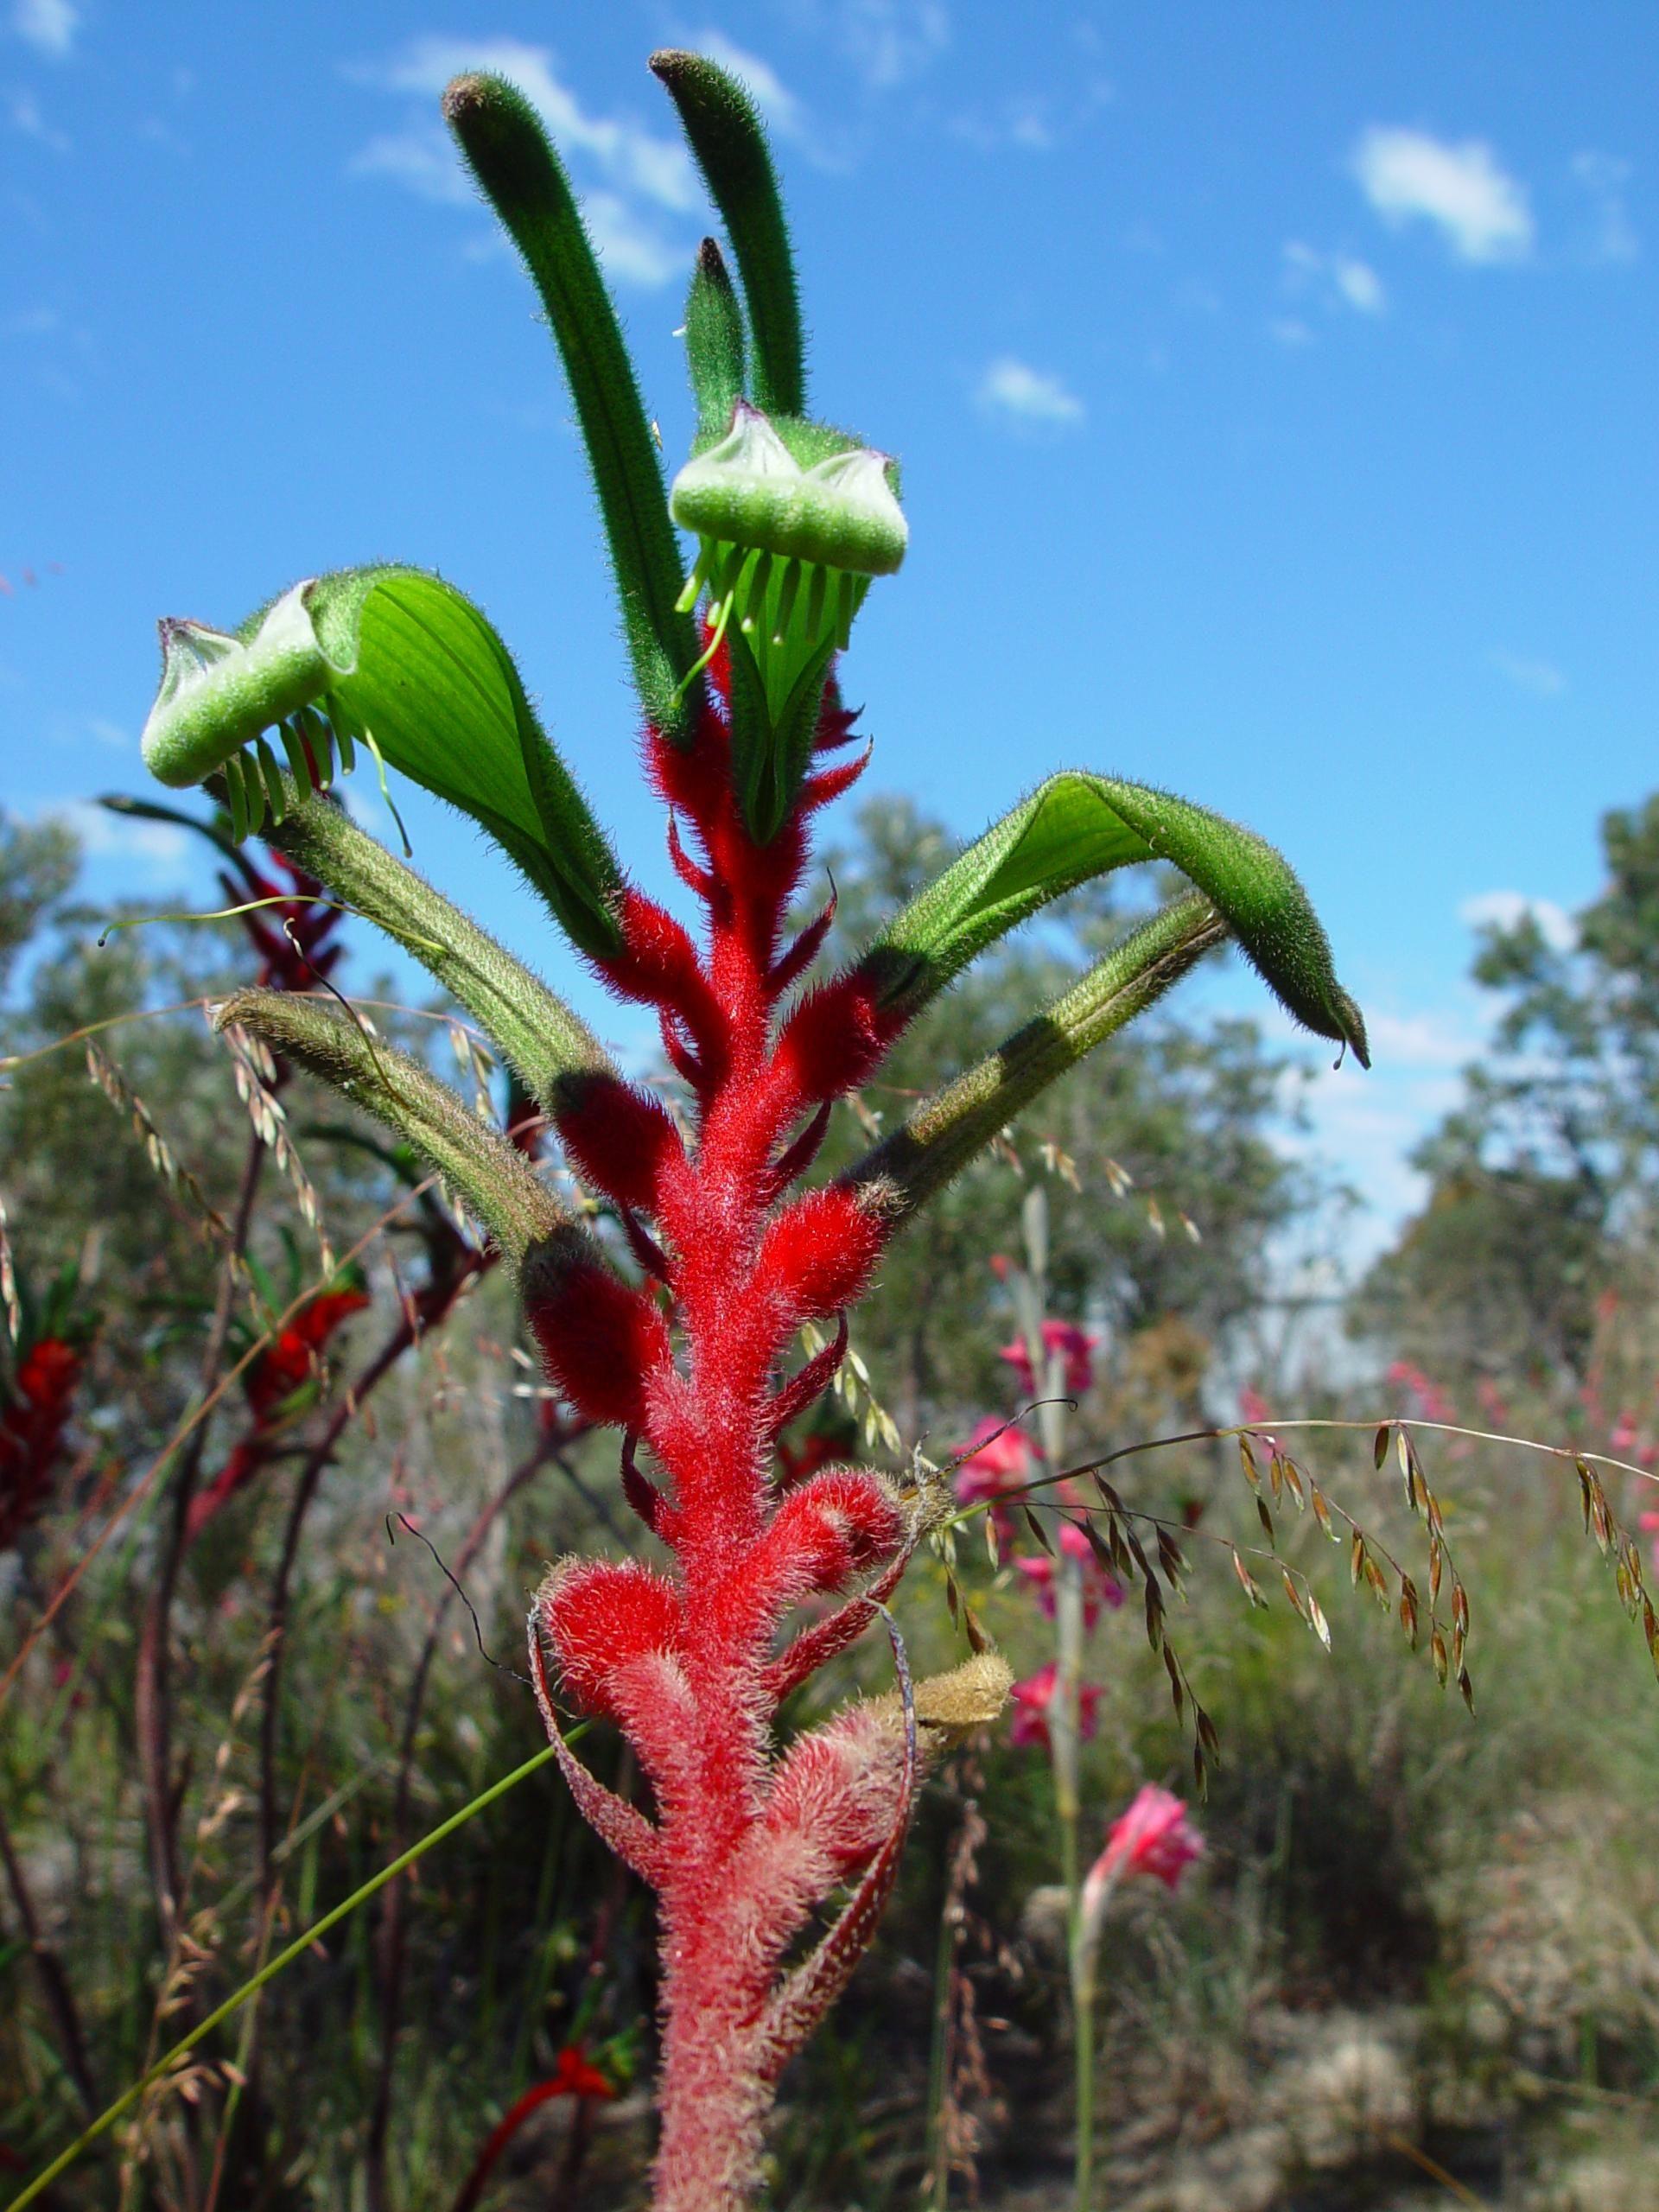 Image Libre Rouge Vert Kangourou Fleur Landsdale Jardins